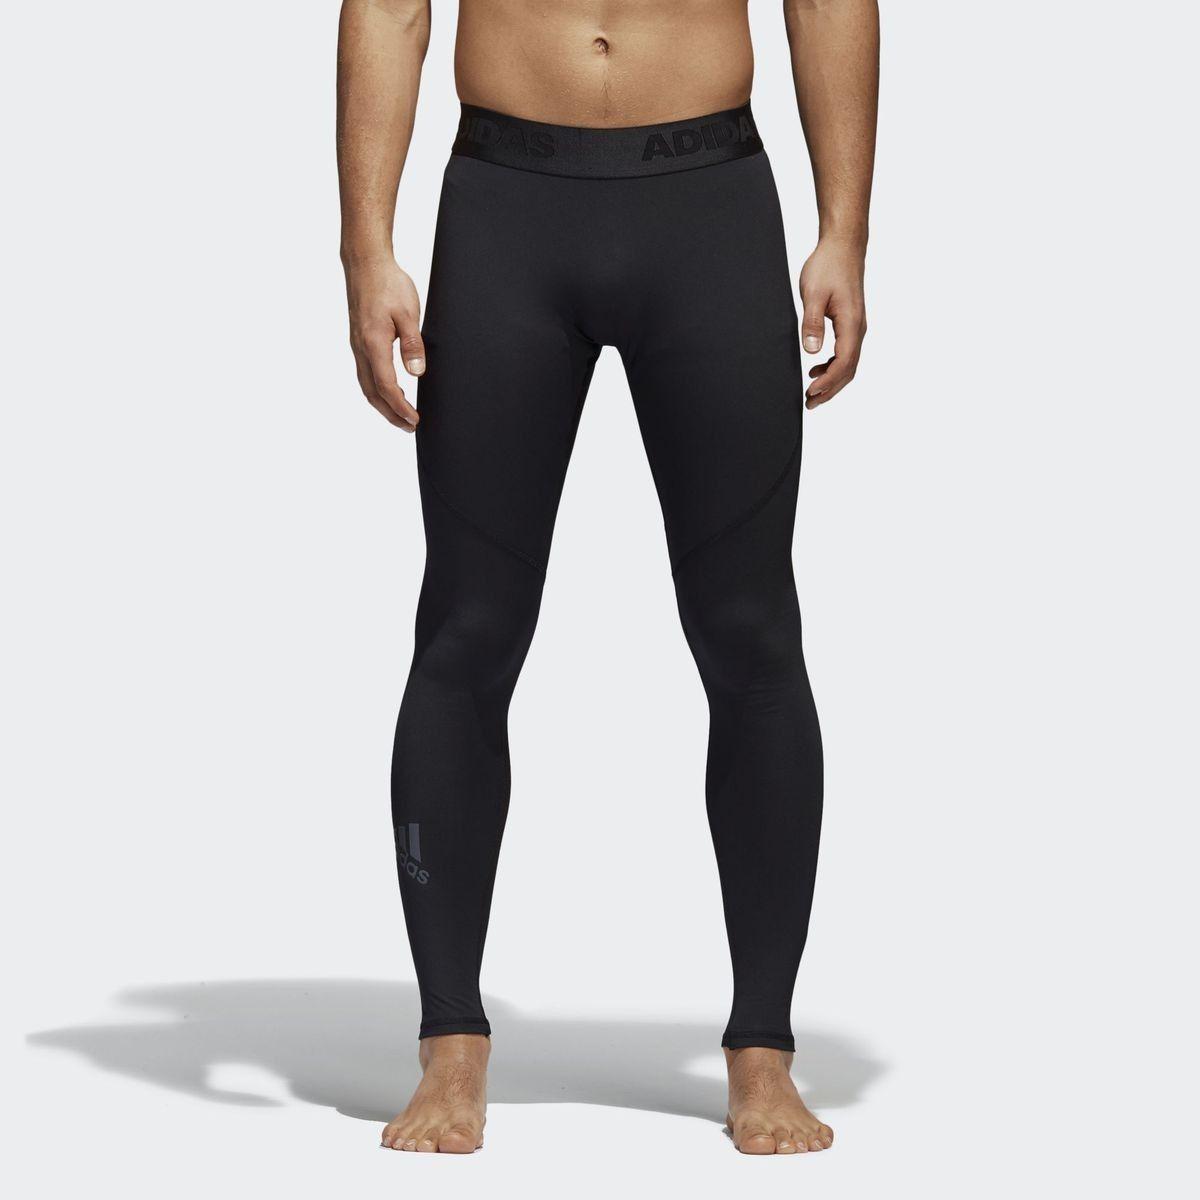 Collant Alphaskin Sport Long   Chaussette sport, Adidas noir